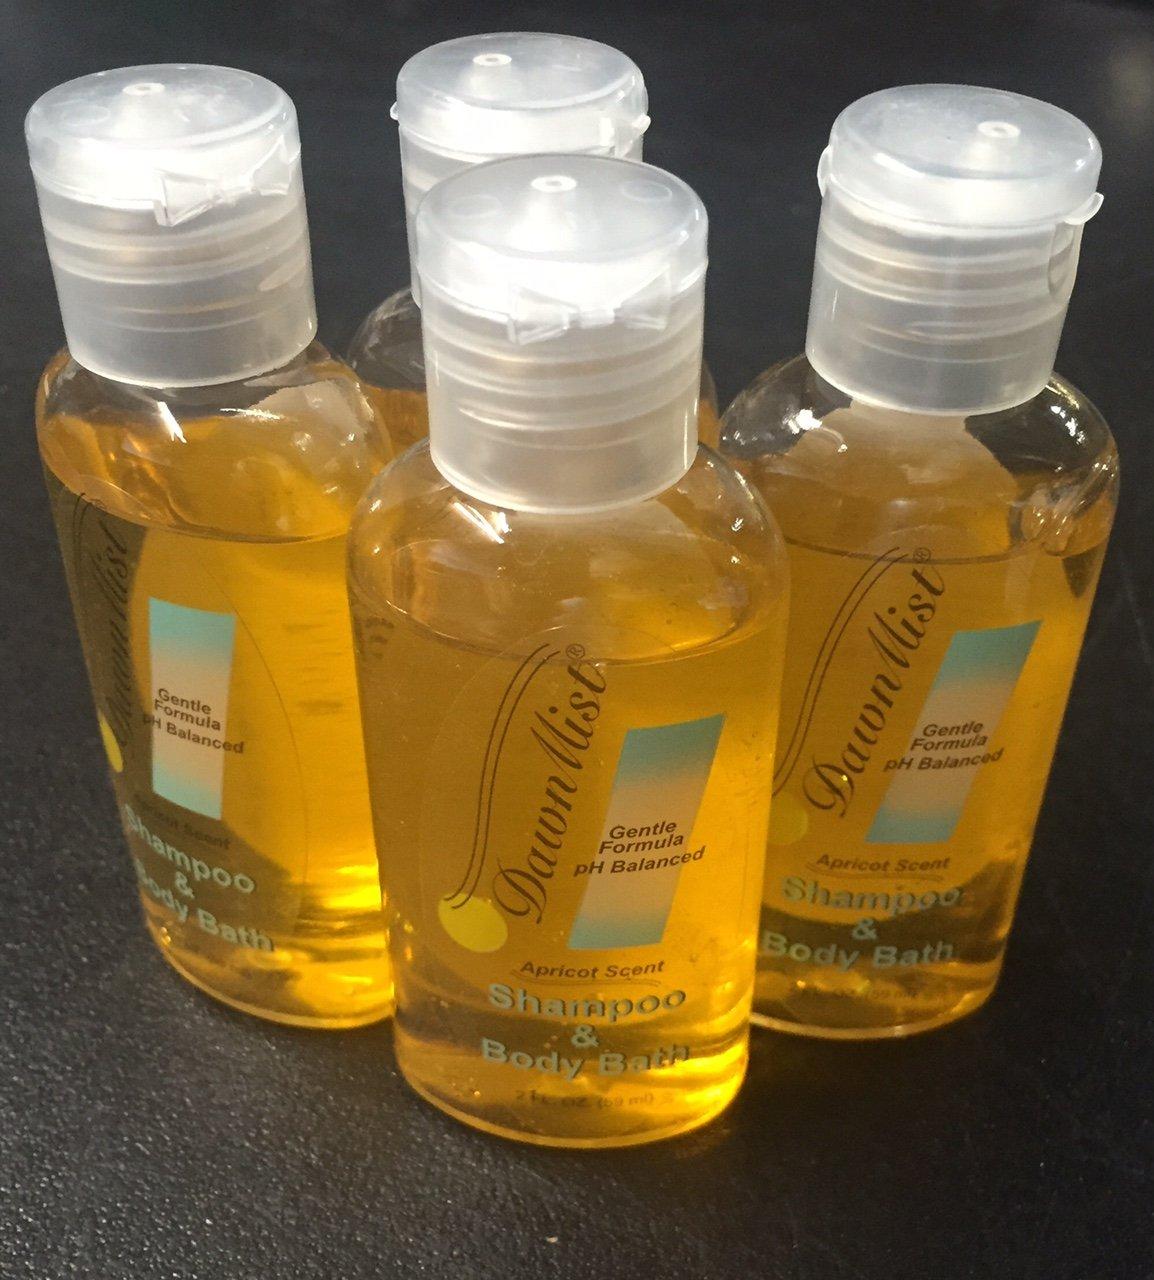 4e37cb172dbb Amazon.com: Dawn Mist Shampoo & Body Wash 4 Pack: Health & Personal Care